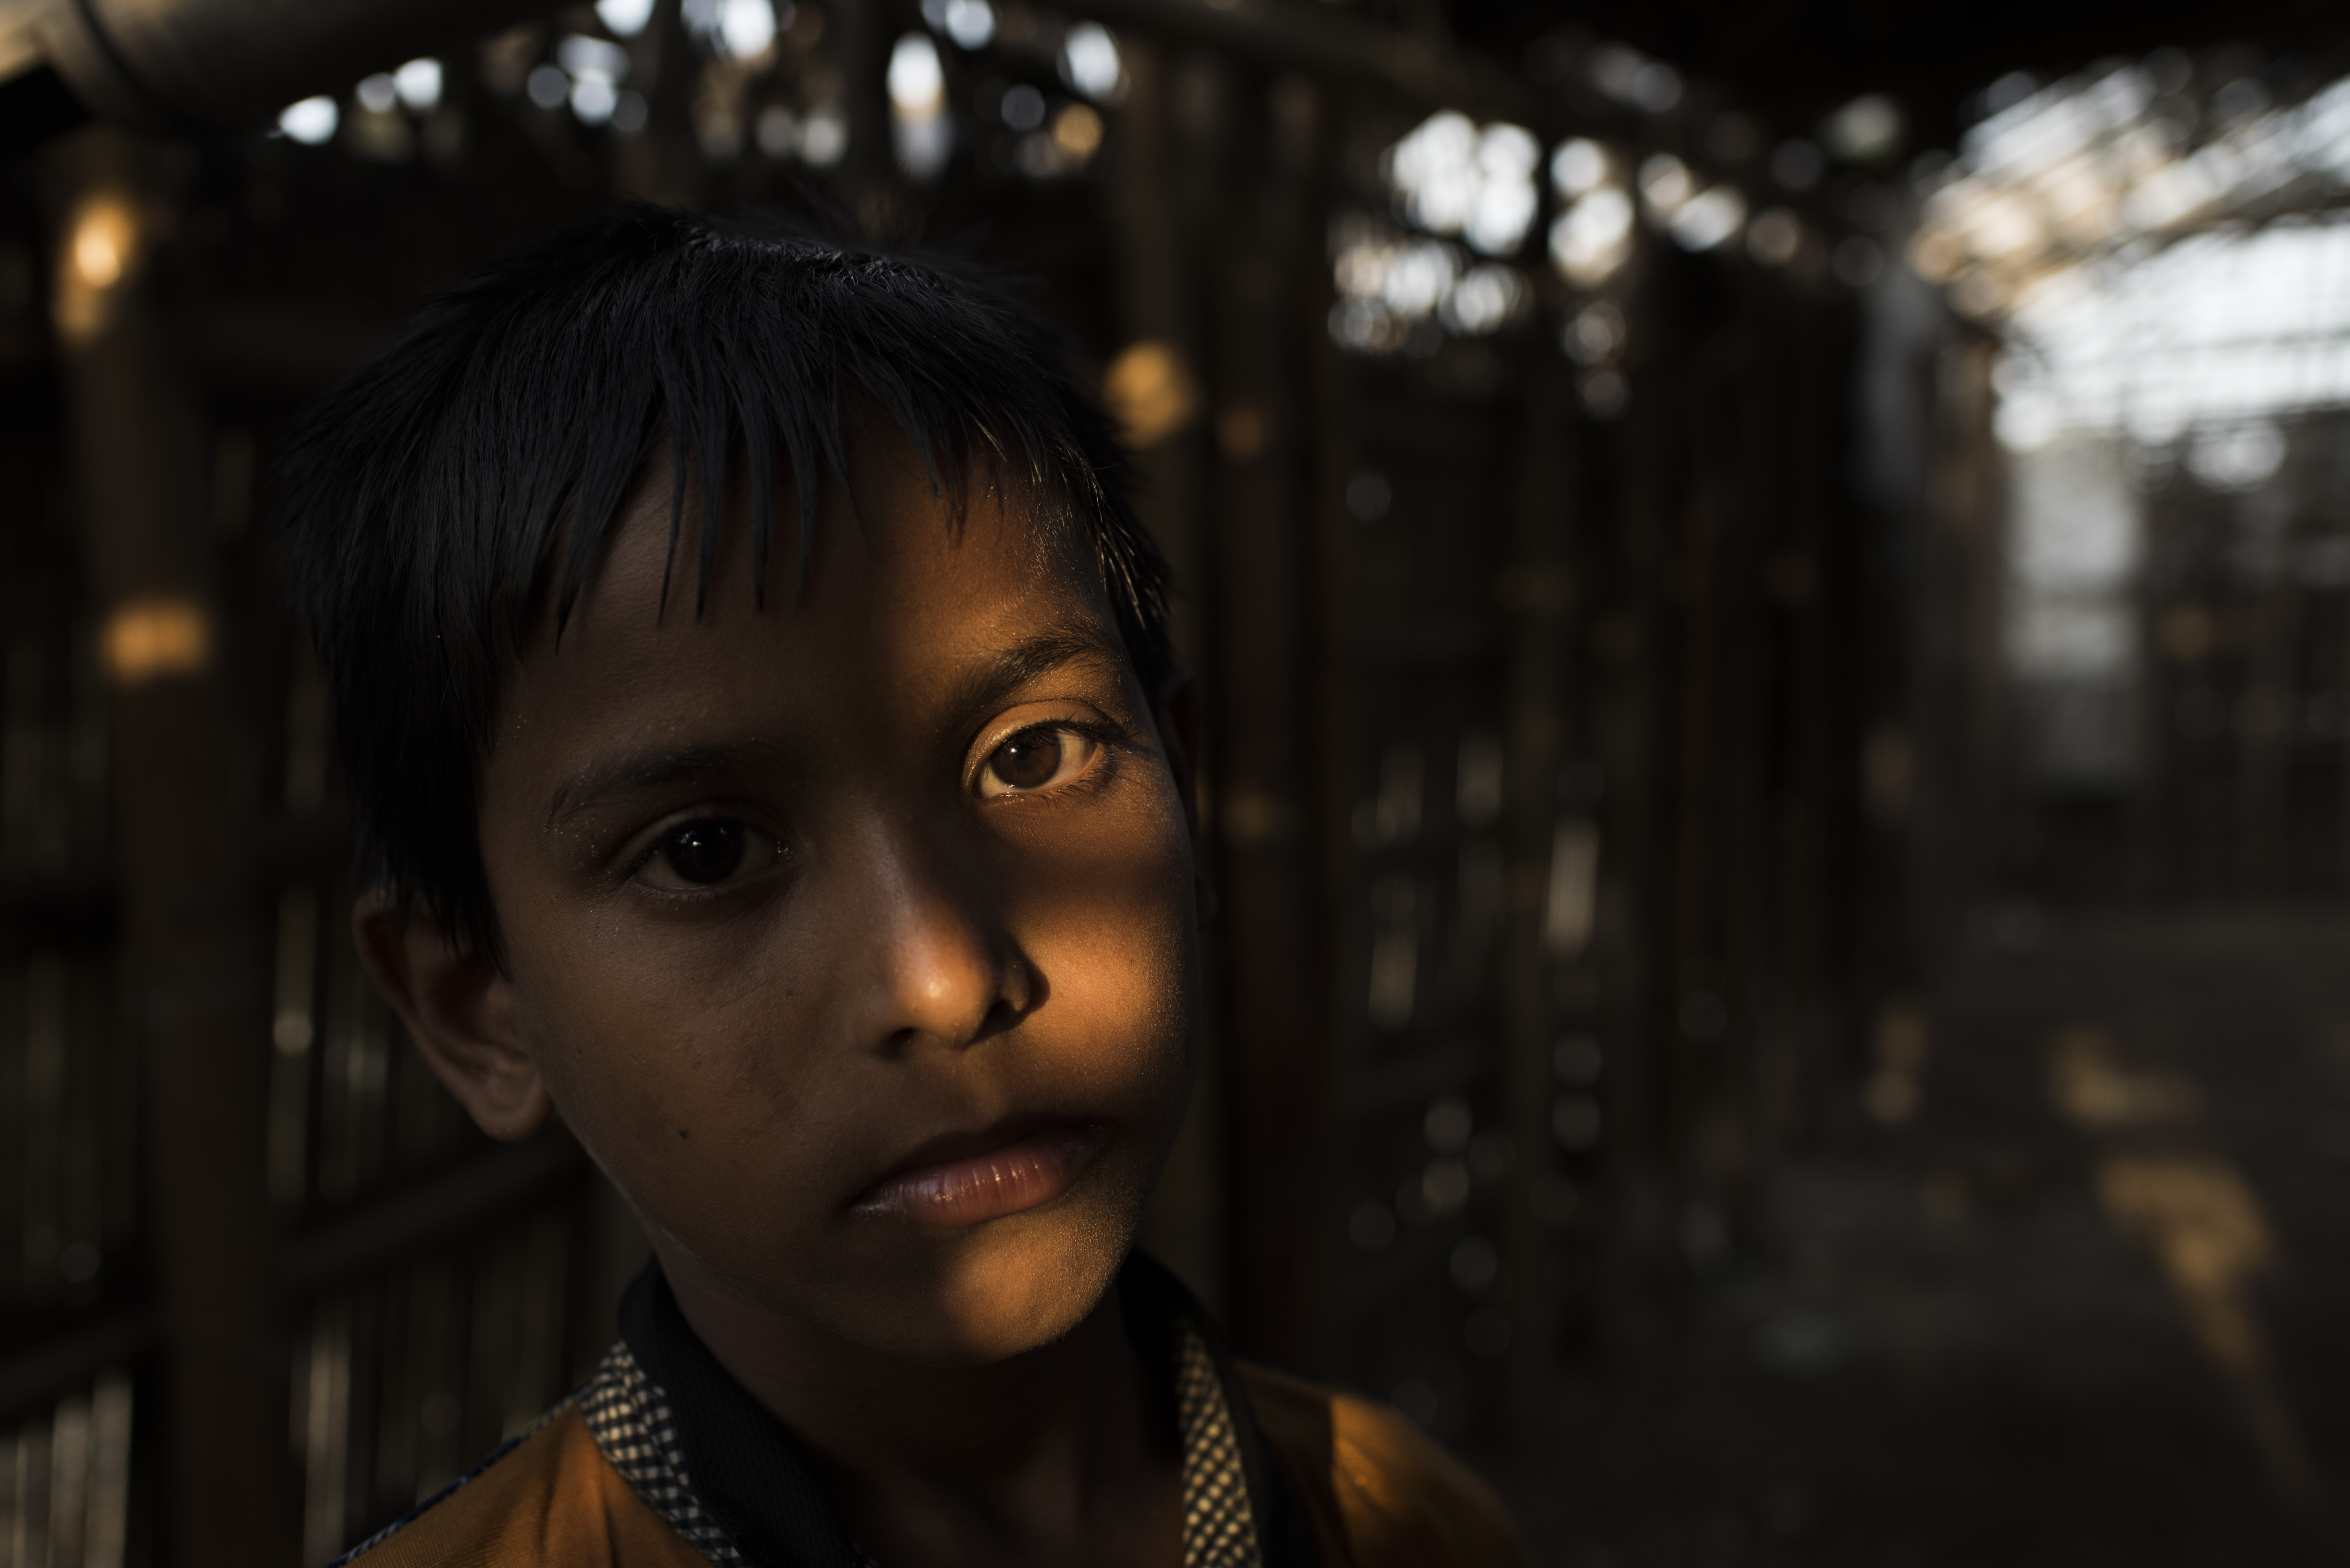 Portrait of a Rohingya boy in Kutupalong Refugee Camp outside of Cox's Bazar, Bangladesh by photojou